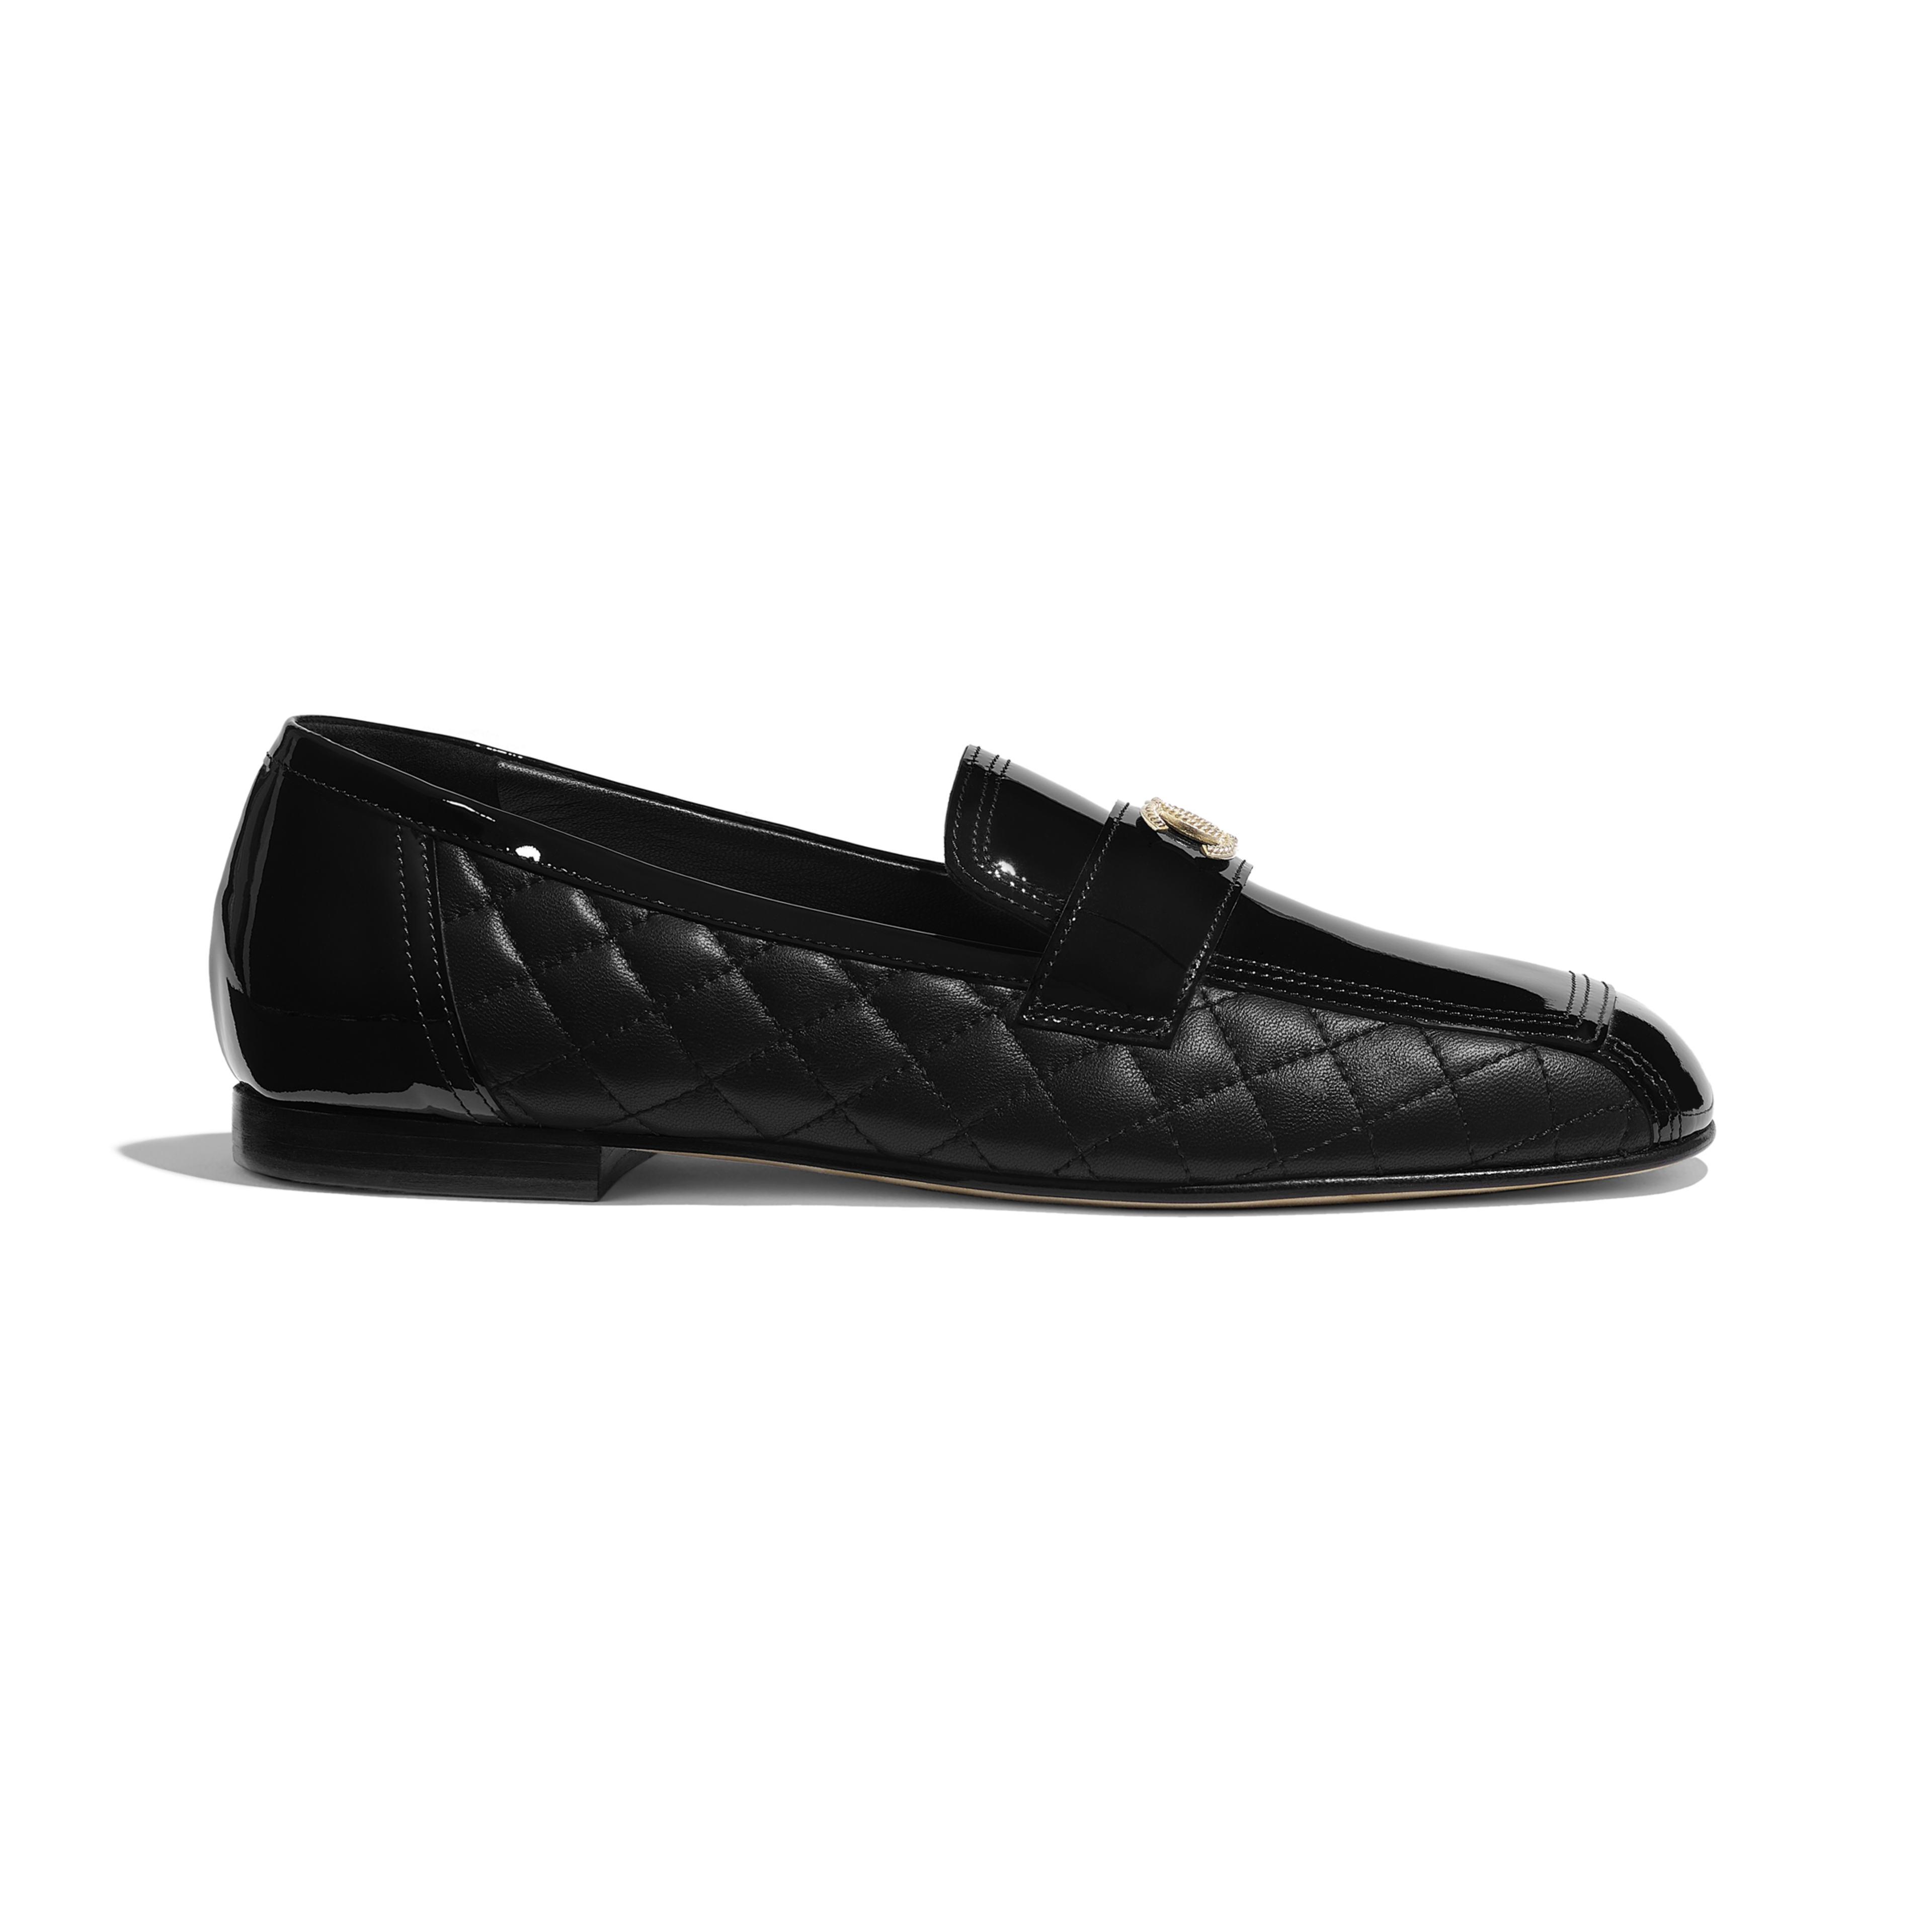 6ebec9331d7 Patent Calfskin   Lambskin Black Loafers